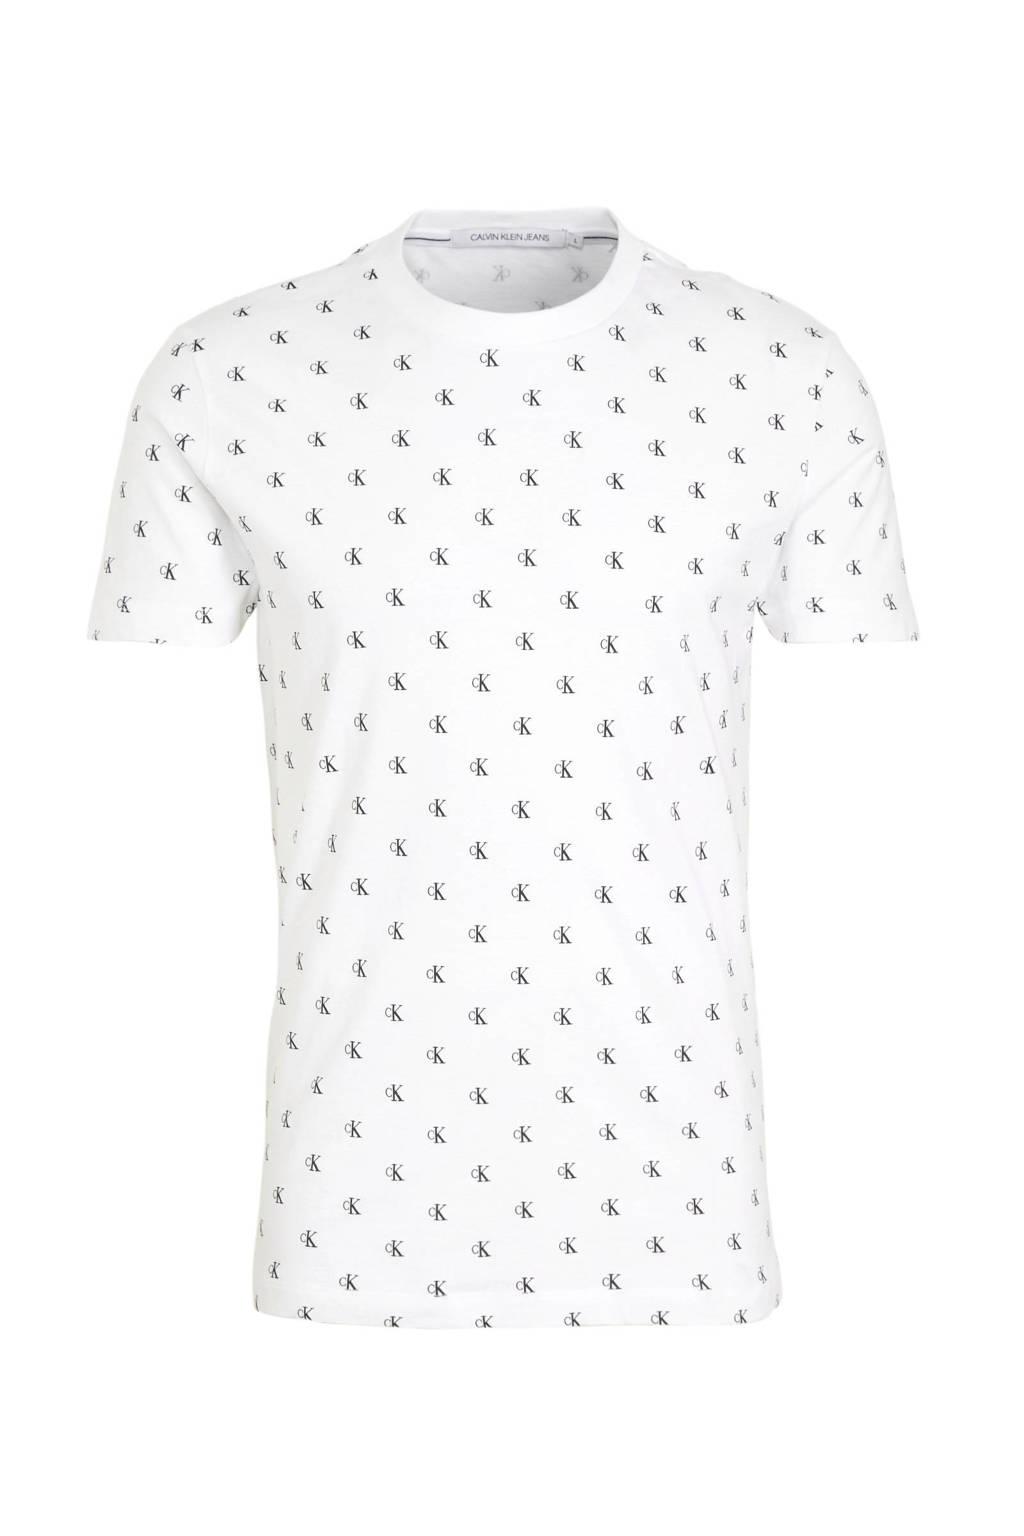 CALVIN KLEIN JEANS T-shirt met all over print wit/zwart, Wit/zwart